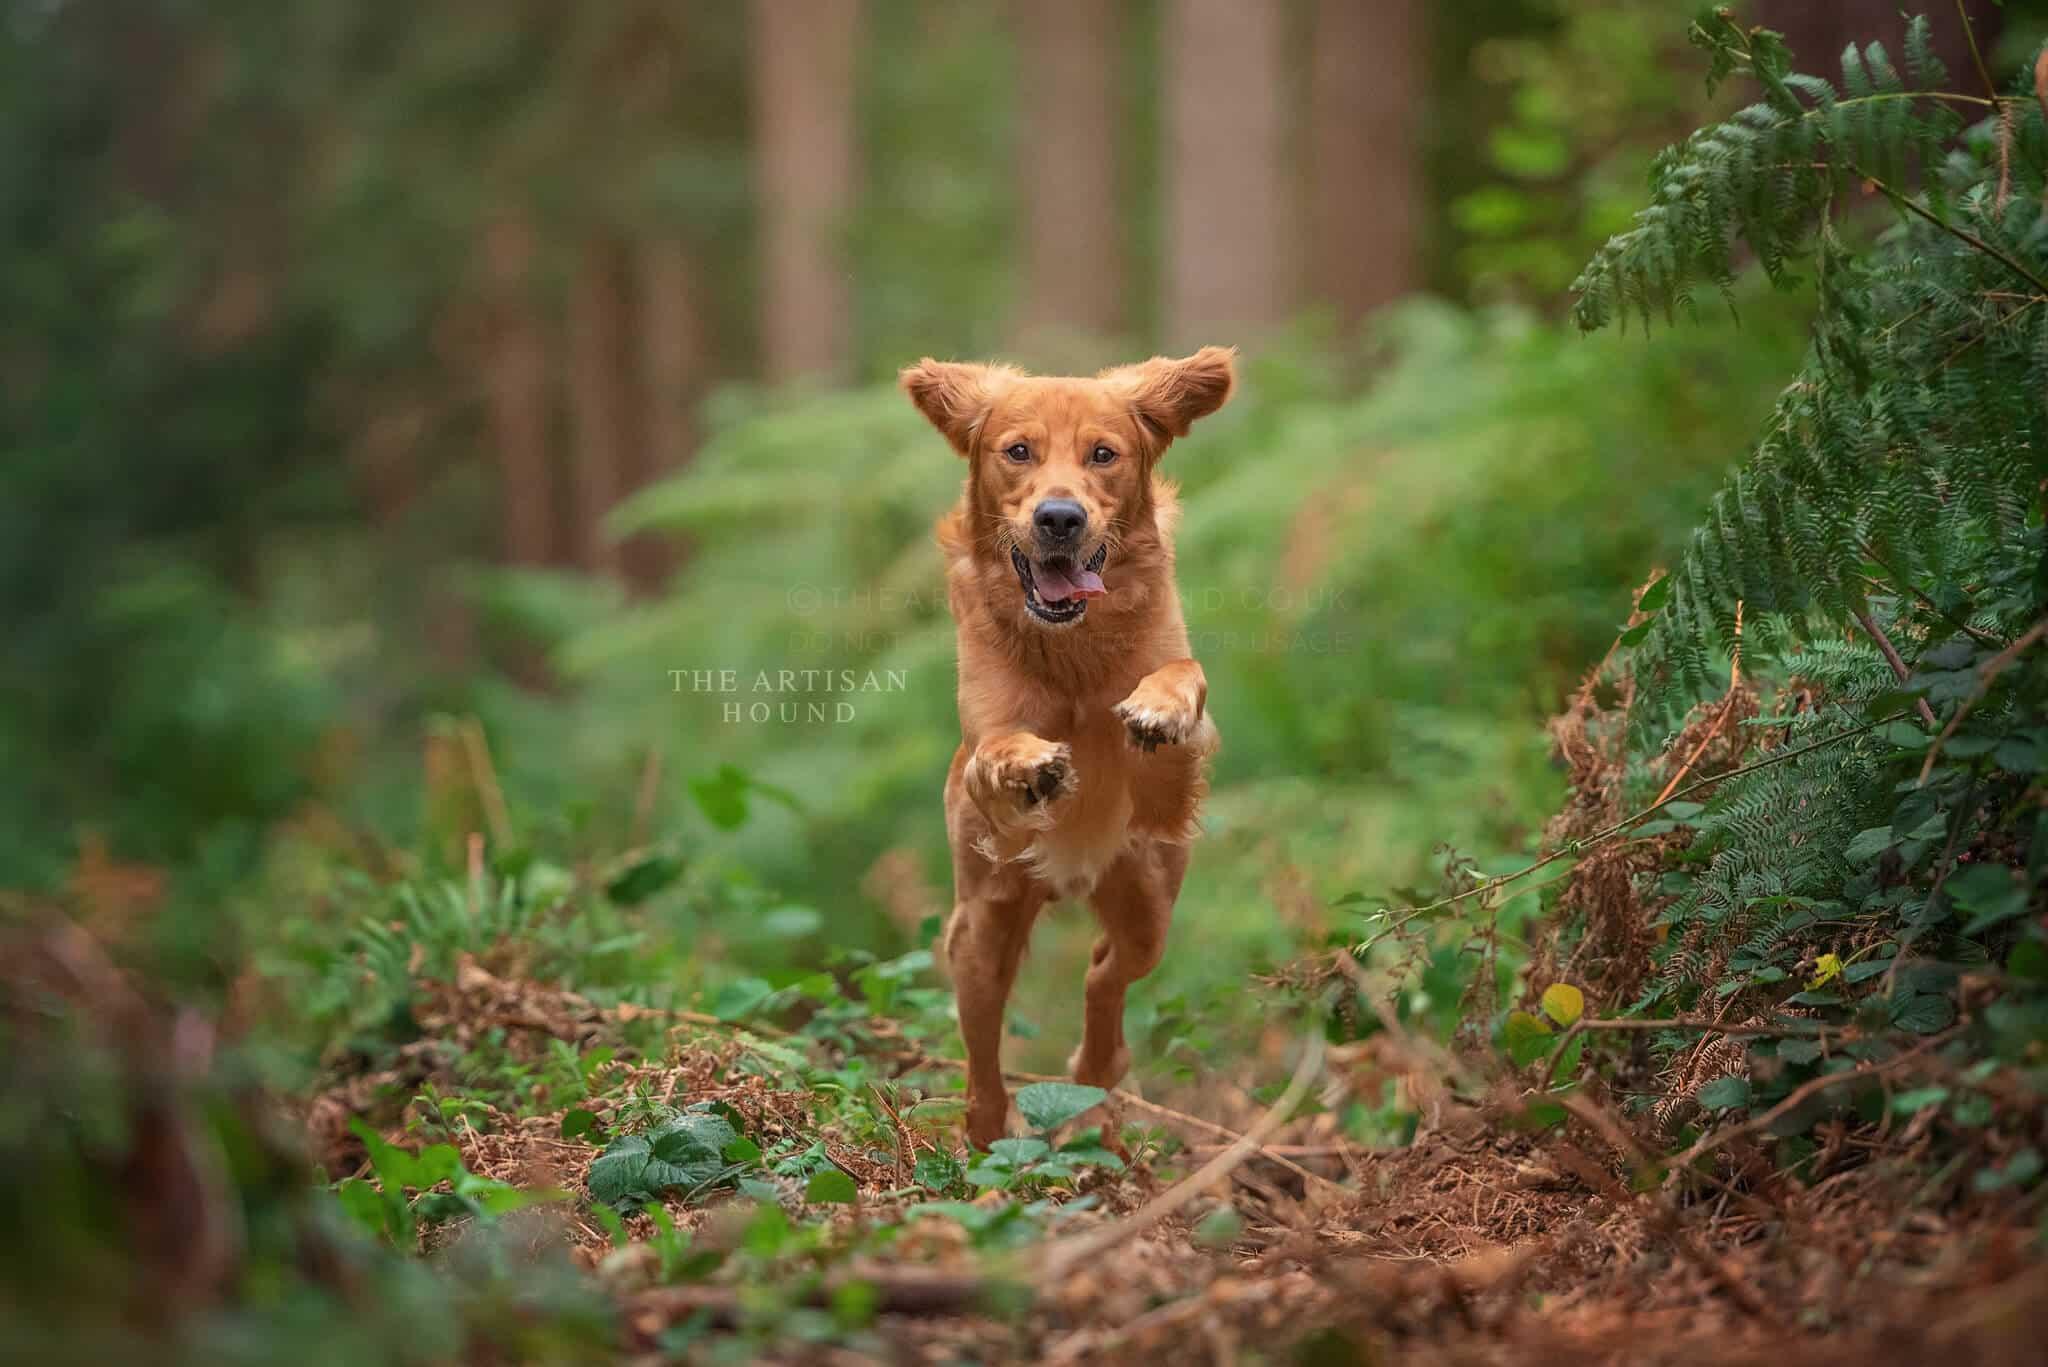 Golden Retriever dog leaping through bracken in woods